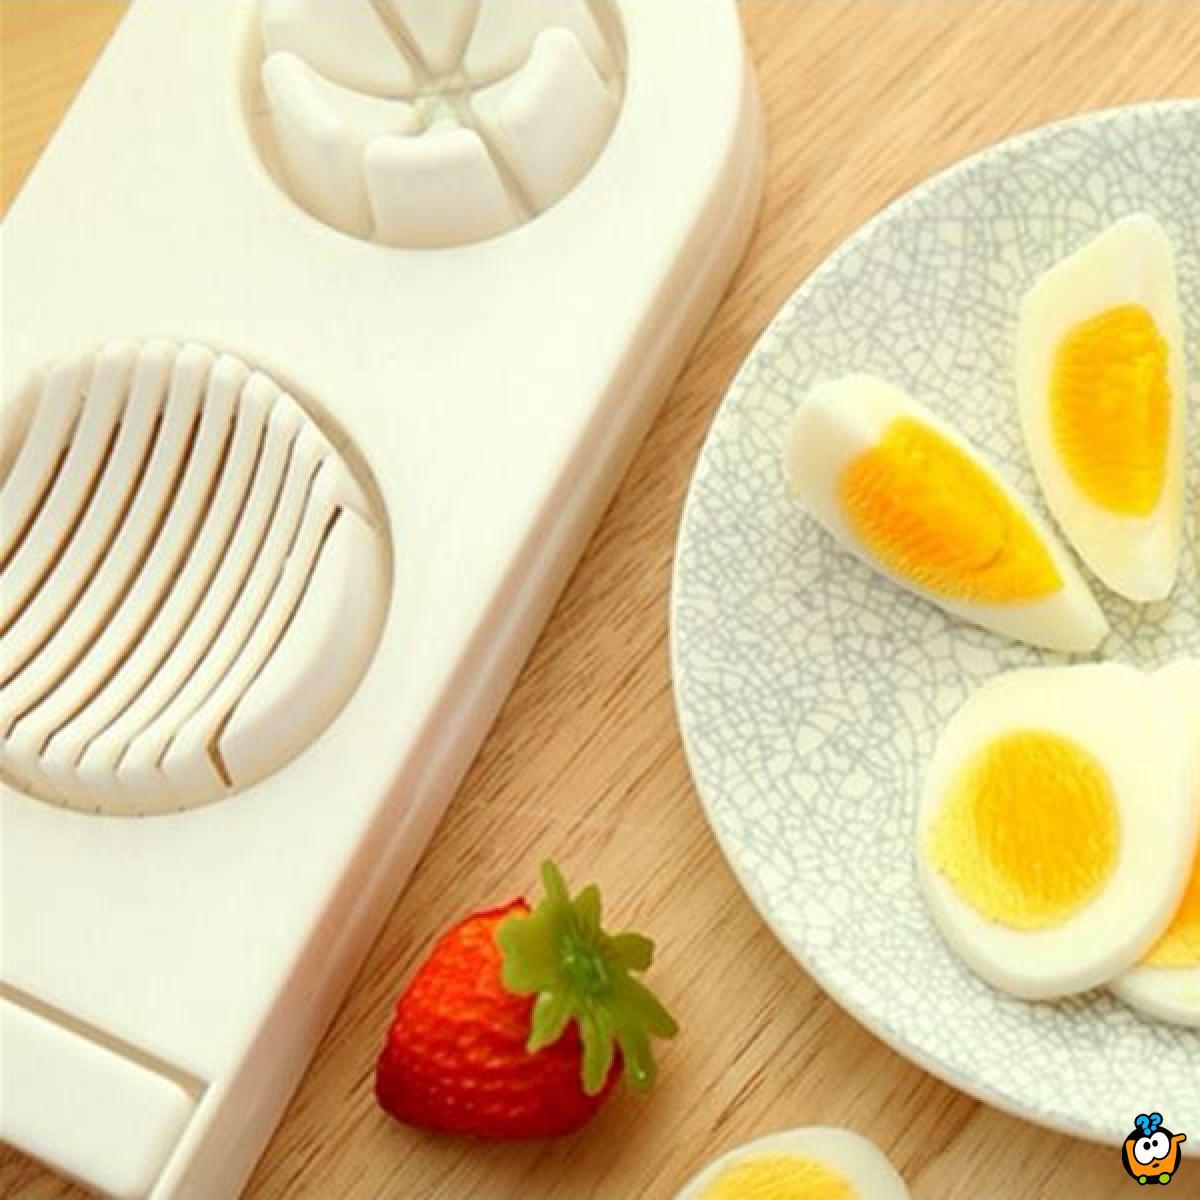 Dvostruki sekač jaja